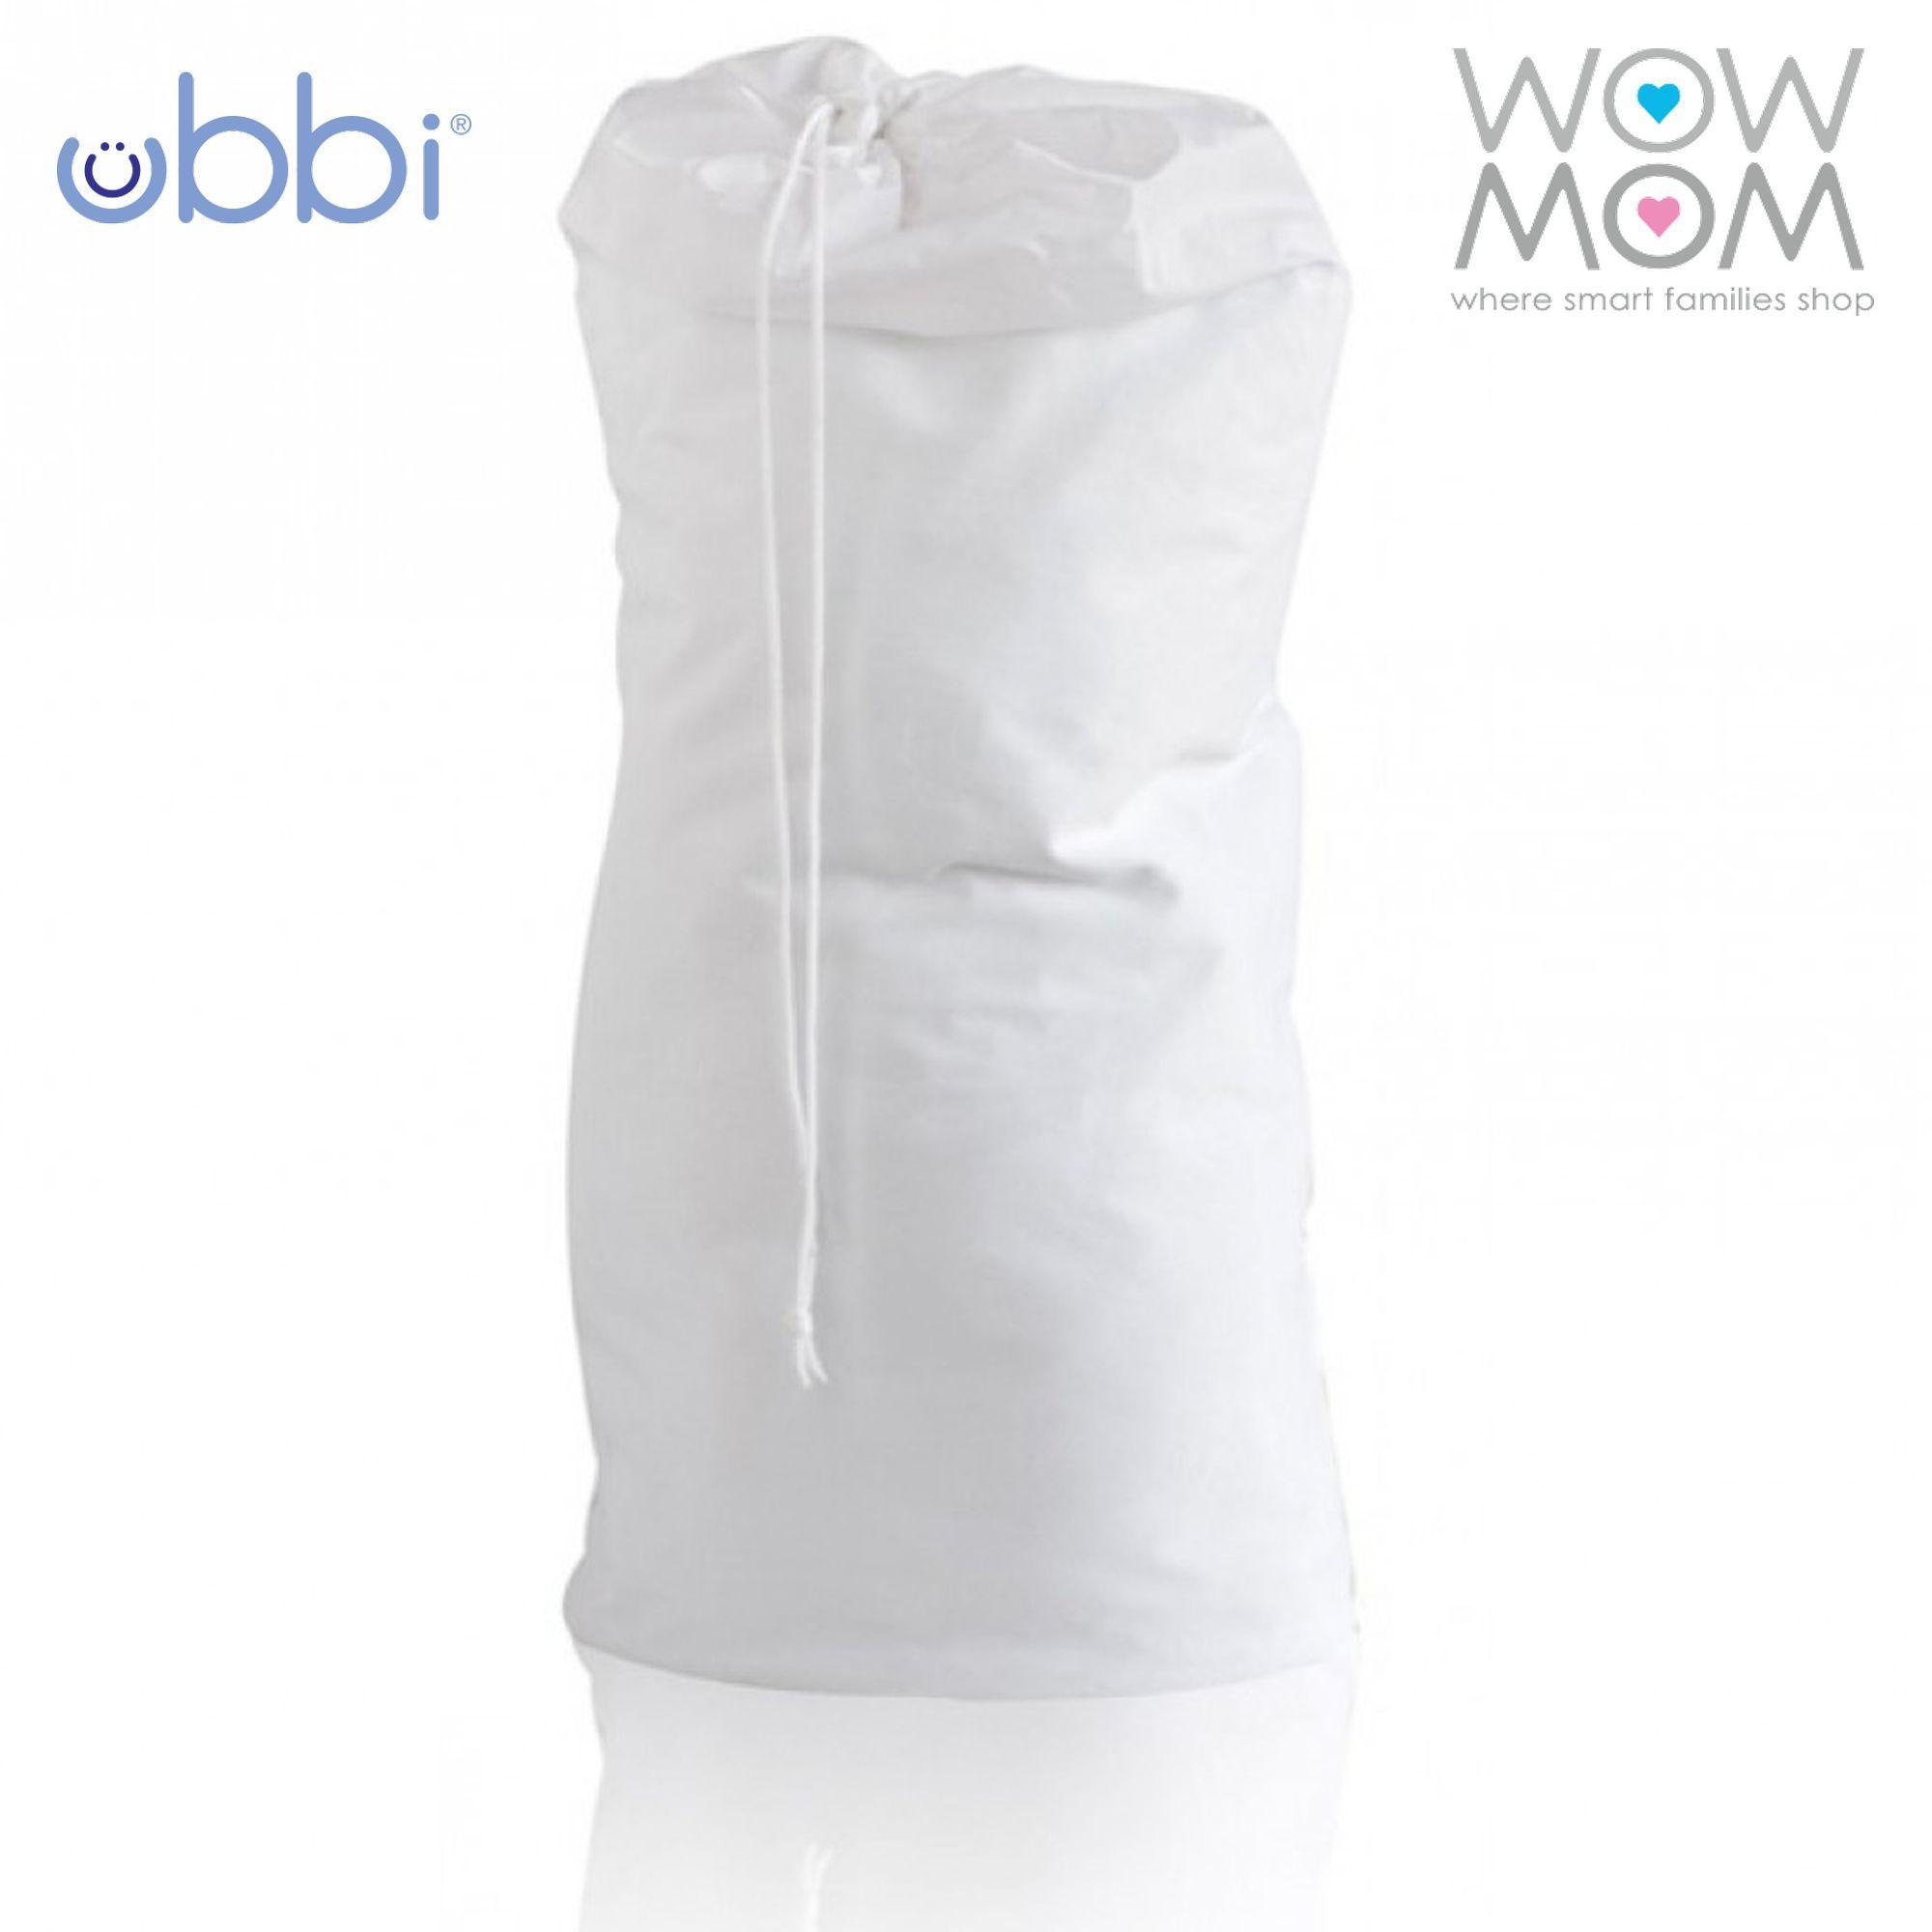 Ubbi Nappy Bin Cloth Liner (26.4l) - 2 Pcs By Wowmom.